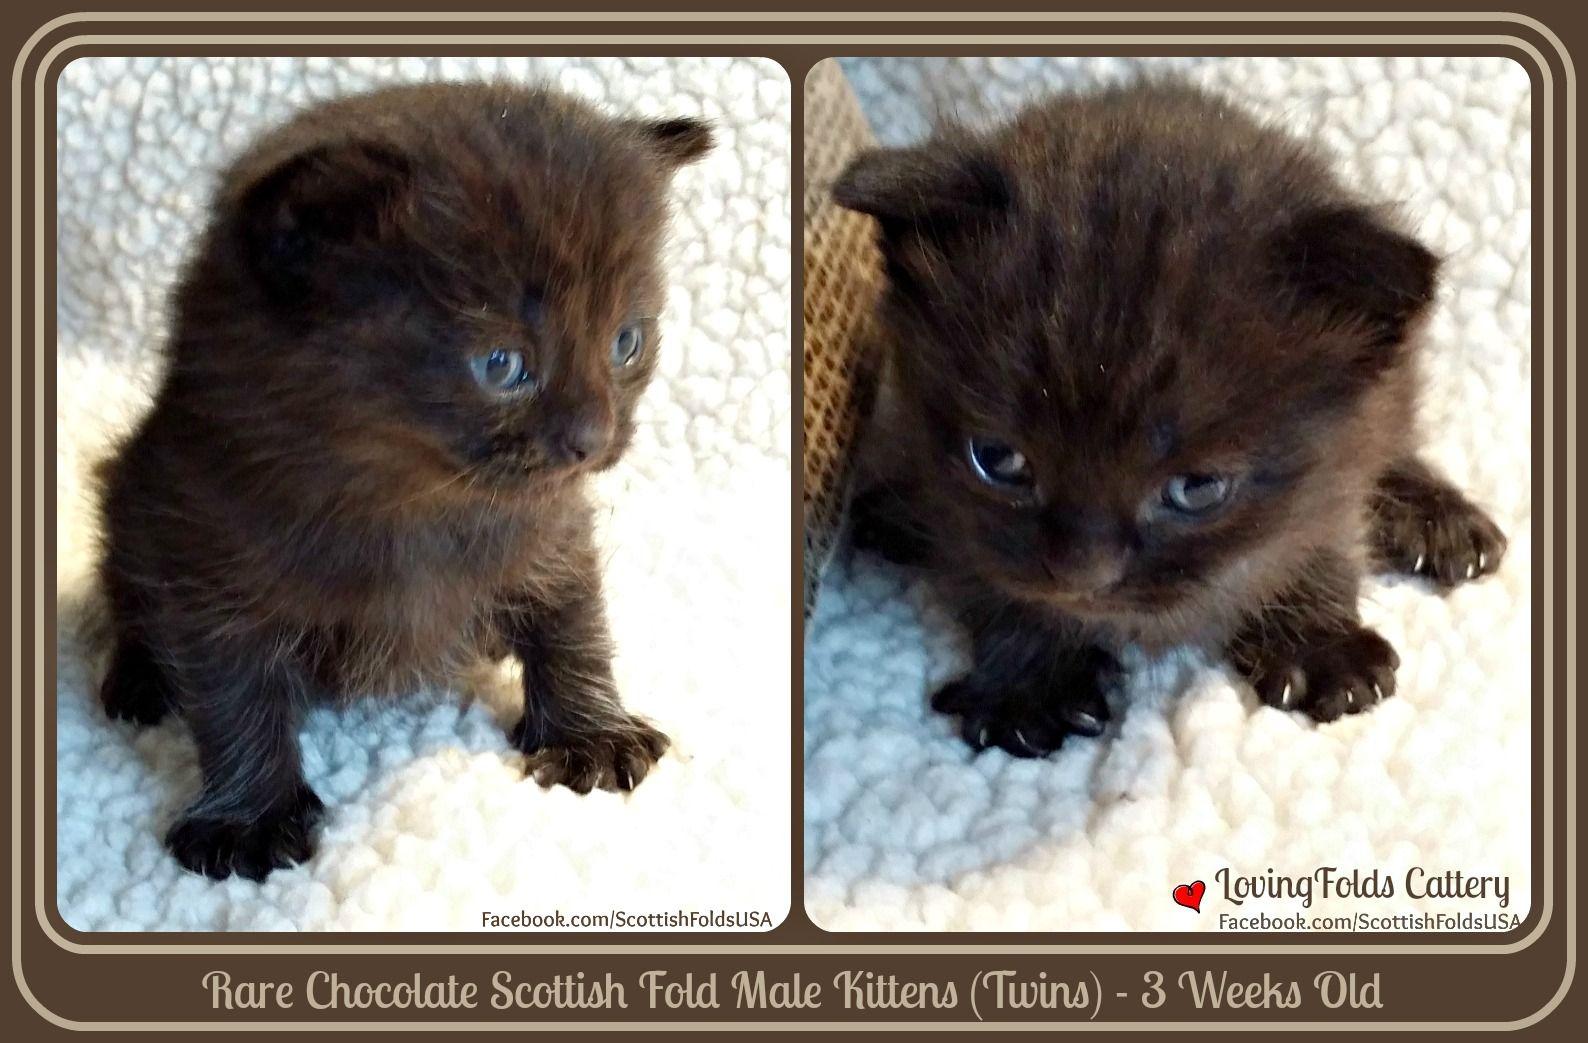 Scottish Fold Kittens Rare Chocolate Color Scottish Fold Kittens Cat Scottish Fold Scottish Fold